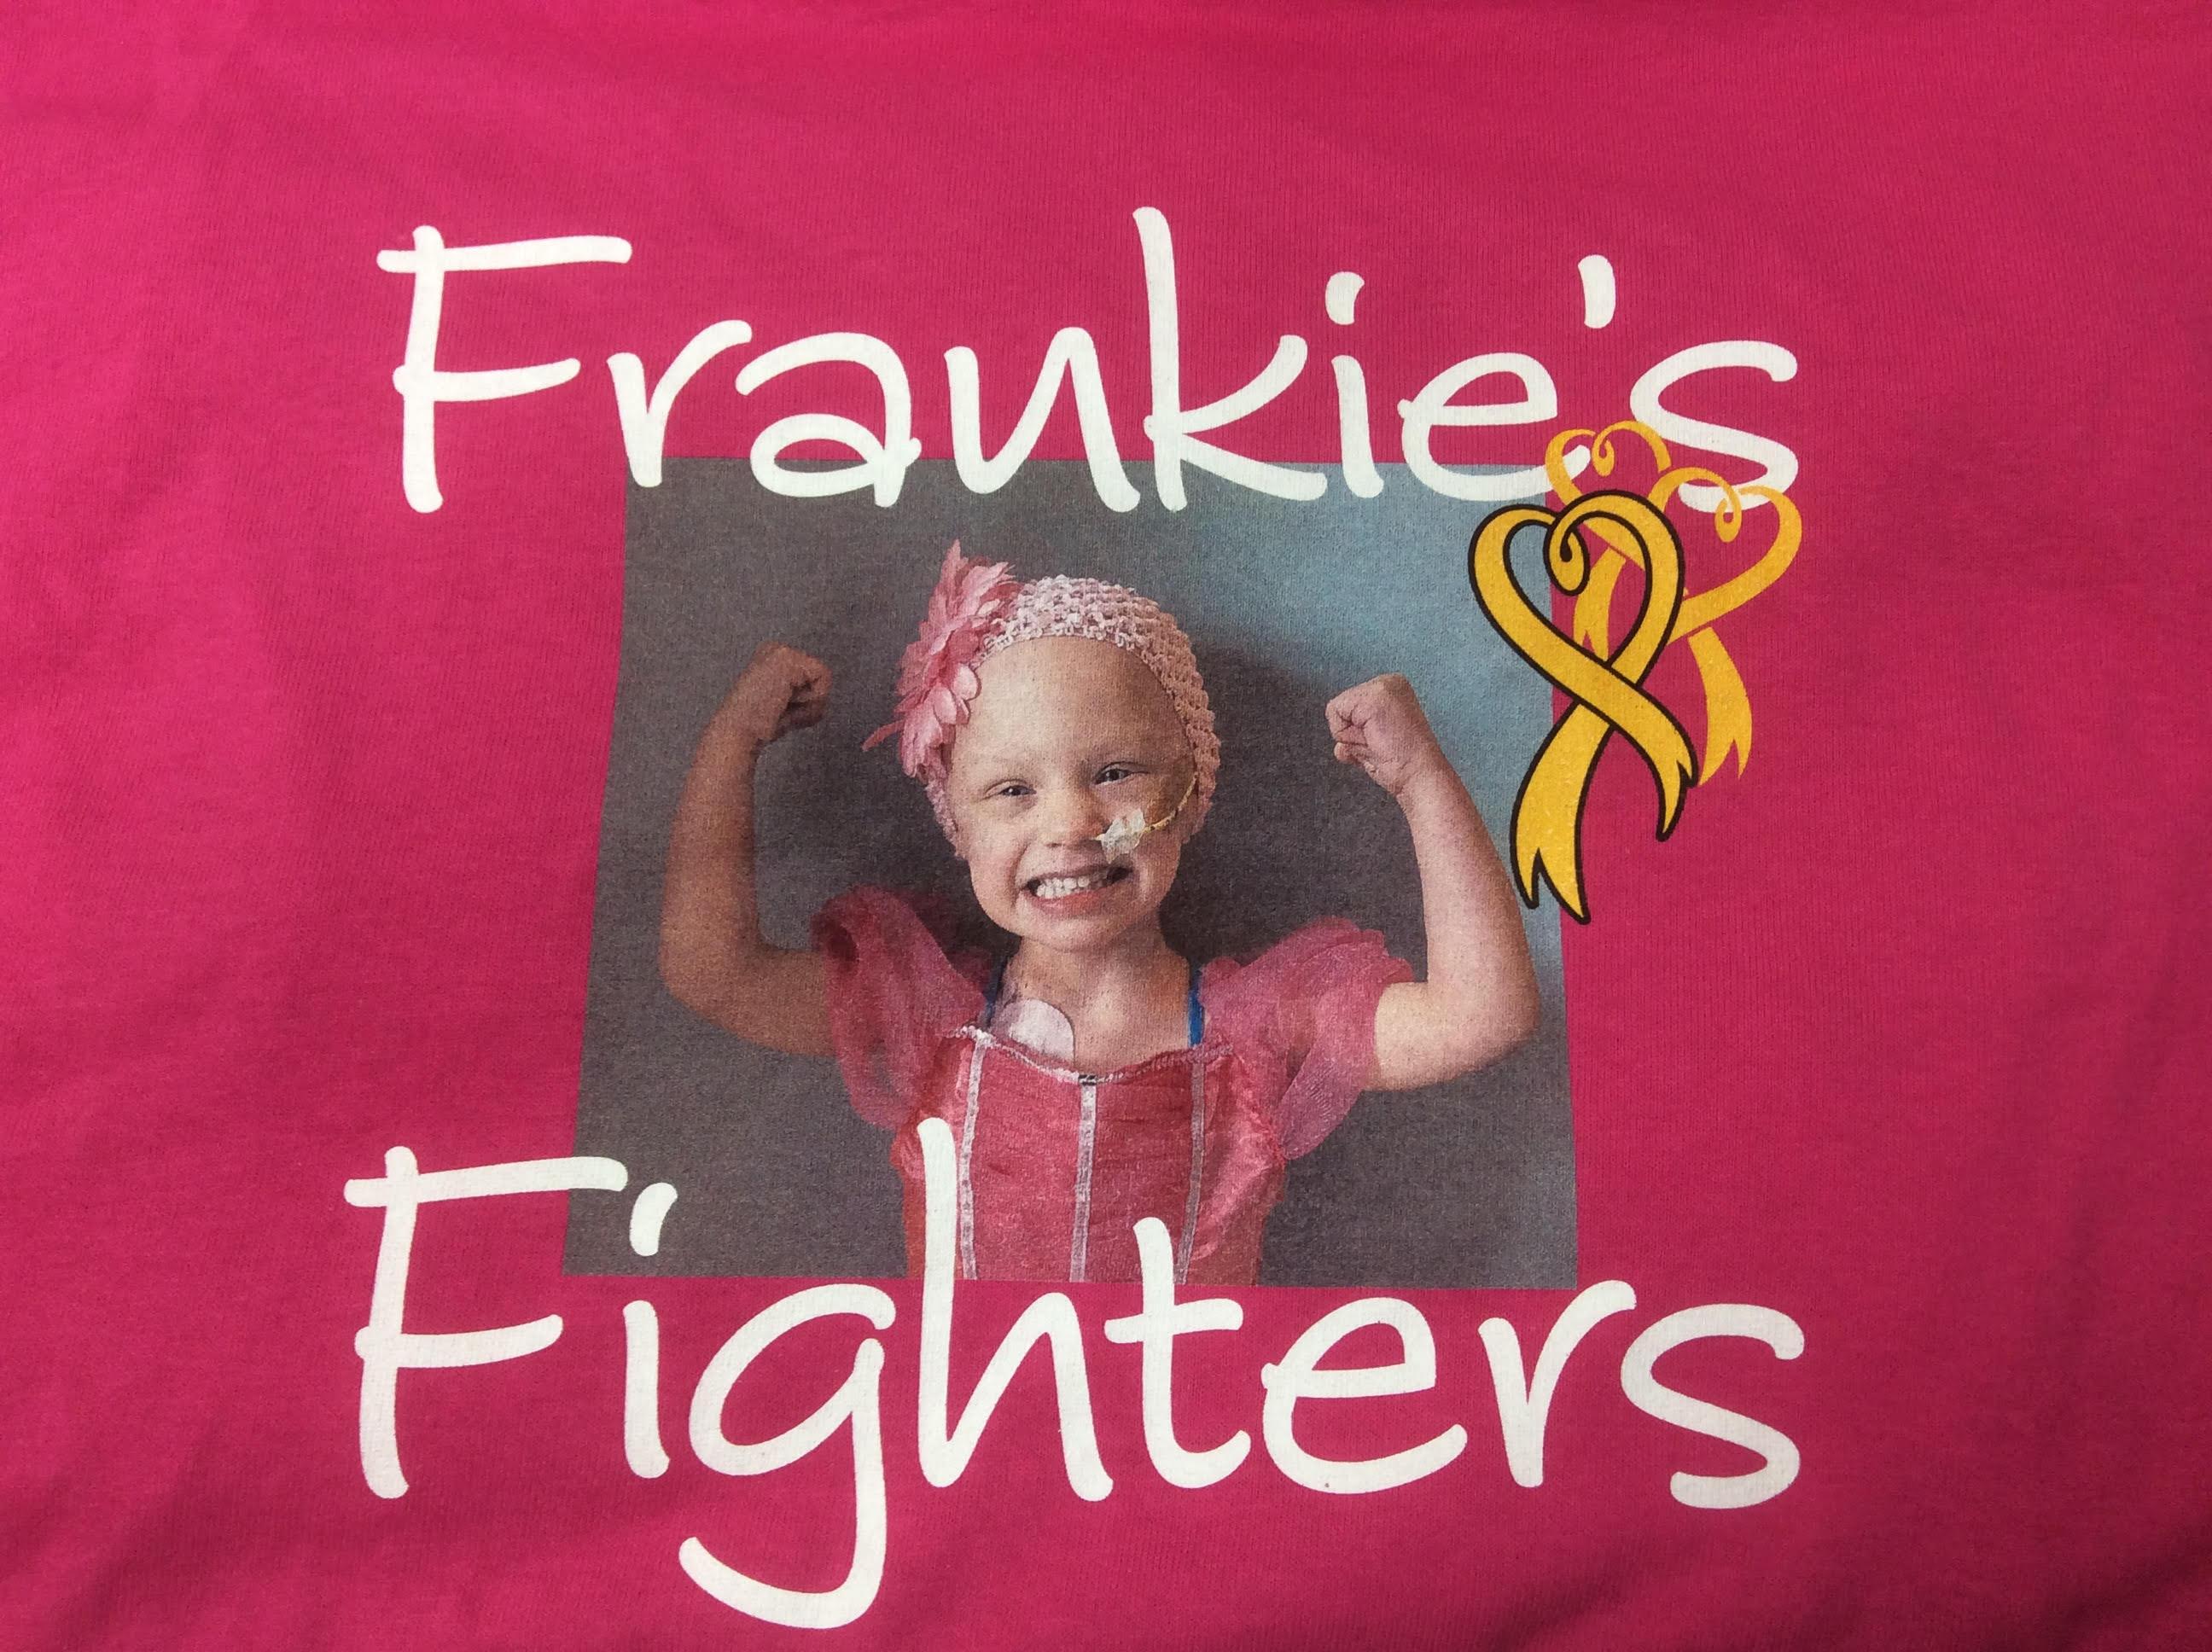 Frankie - Share A Card